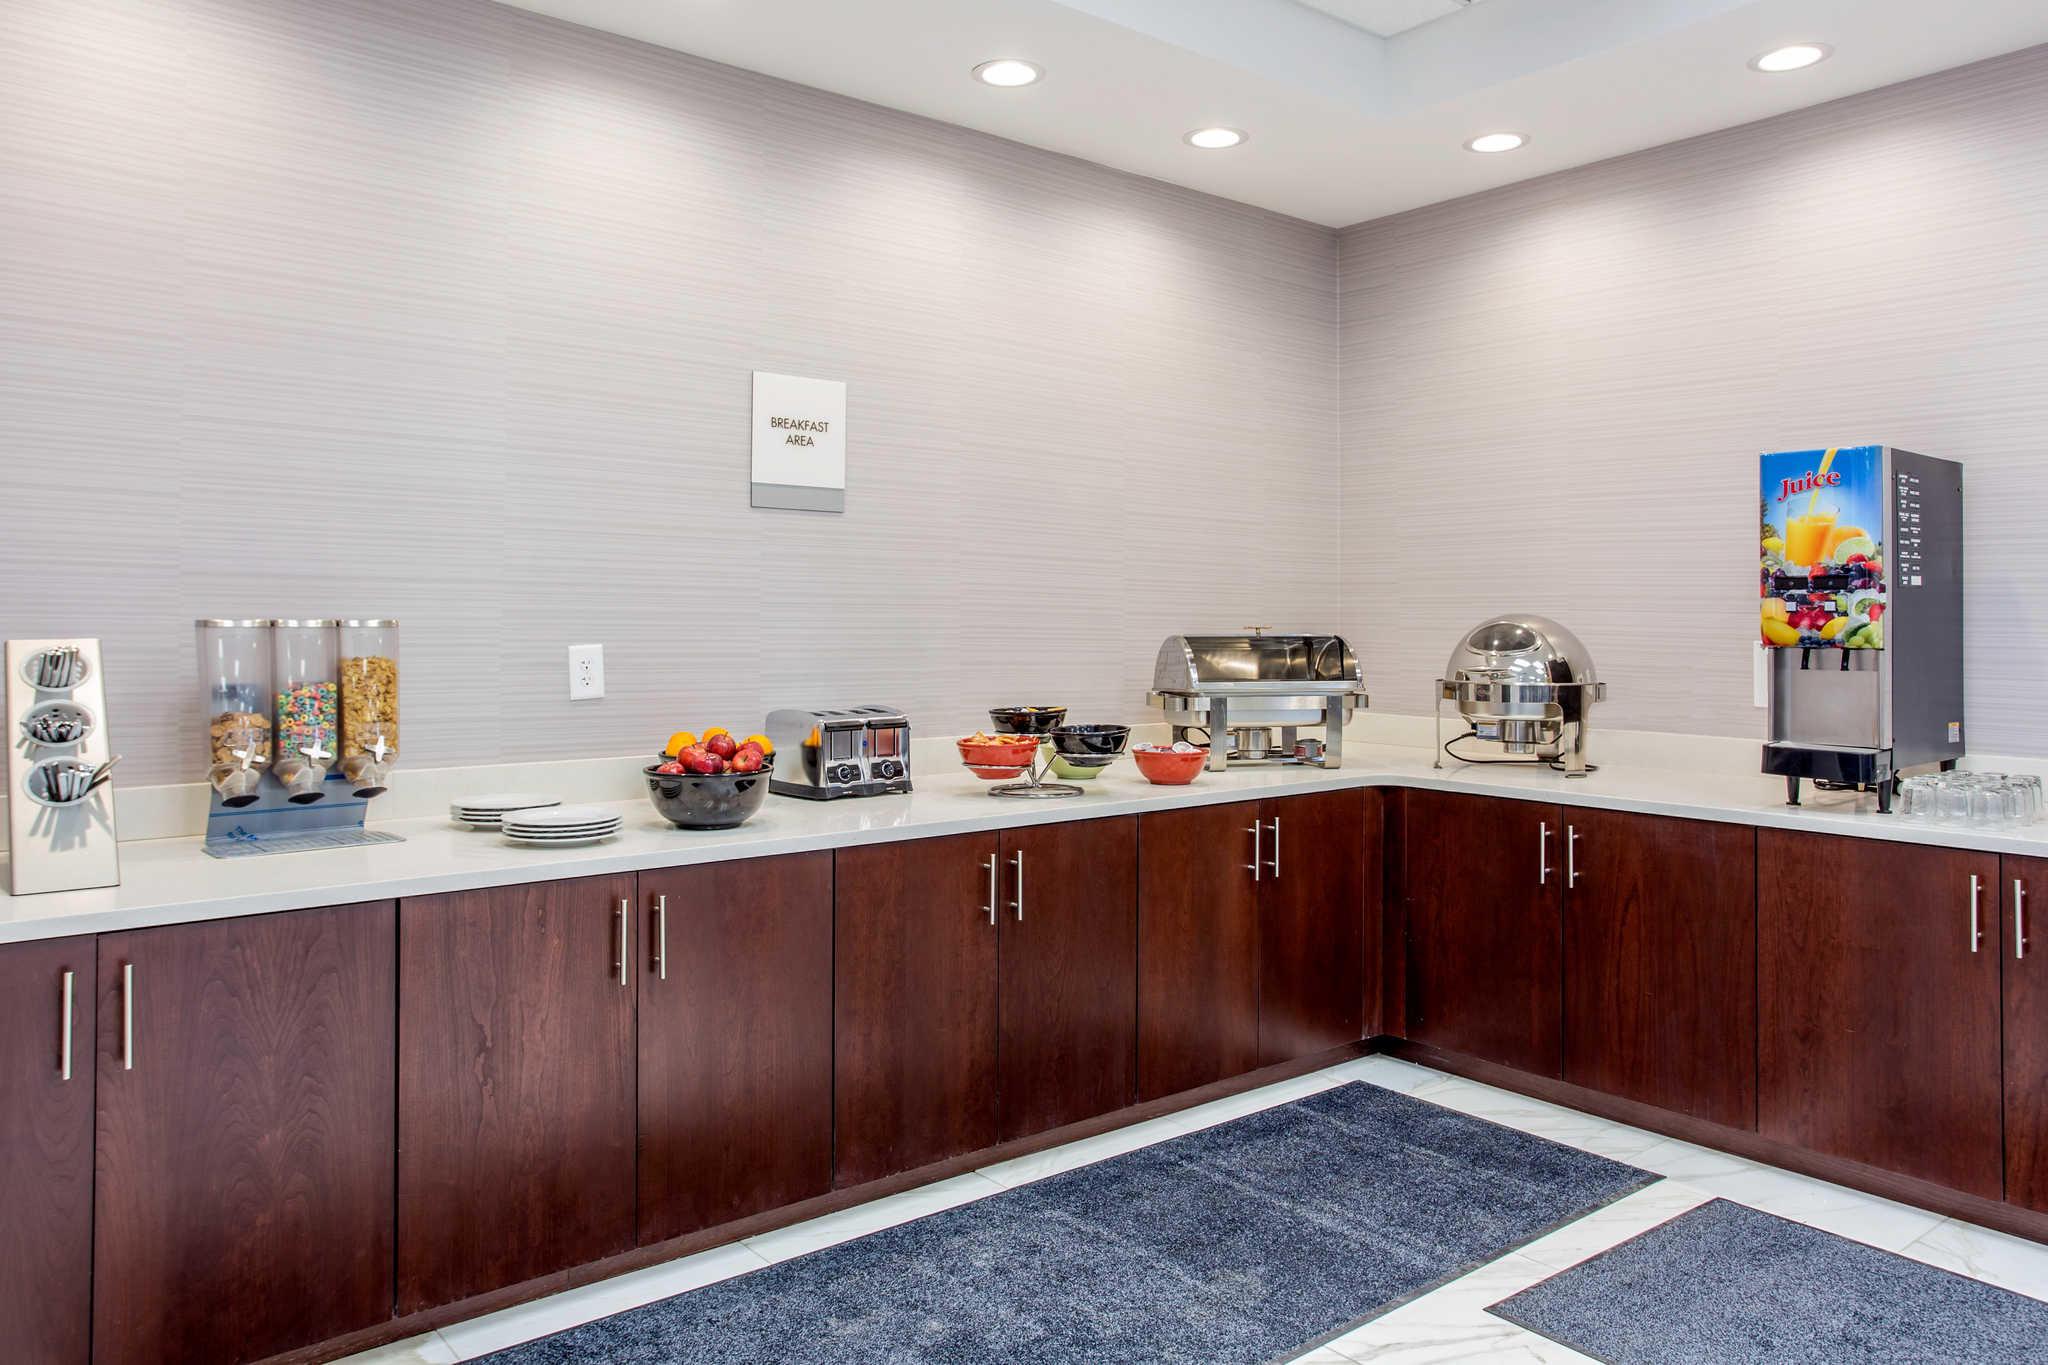 Clarion Inn & Suites image 23